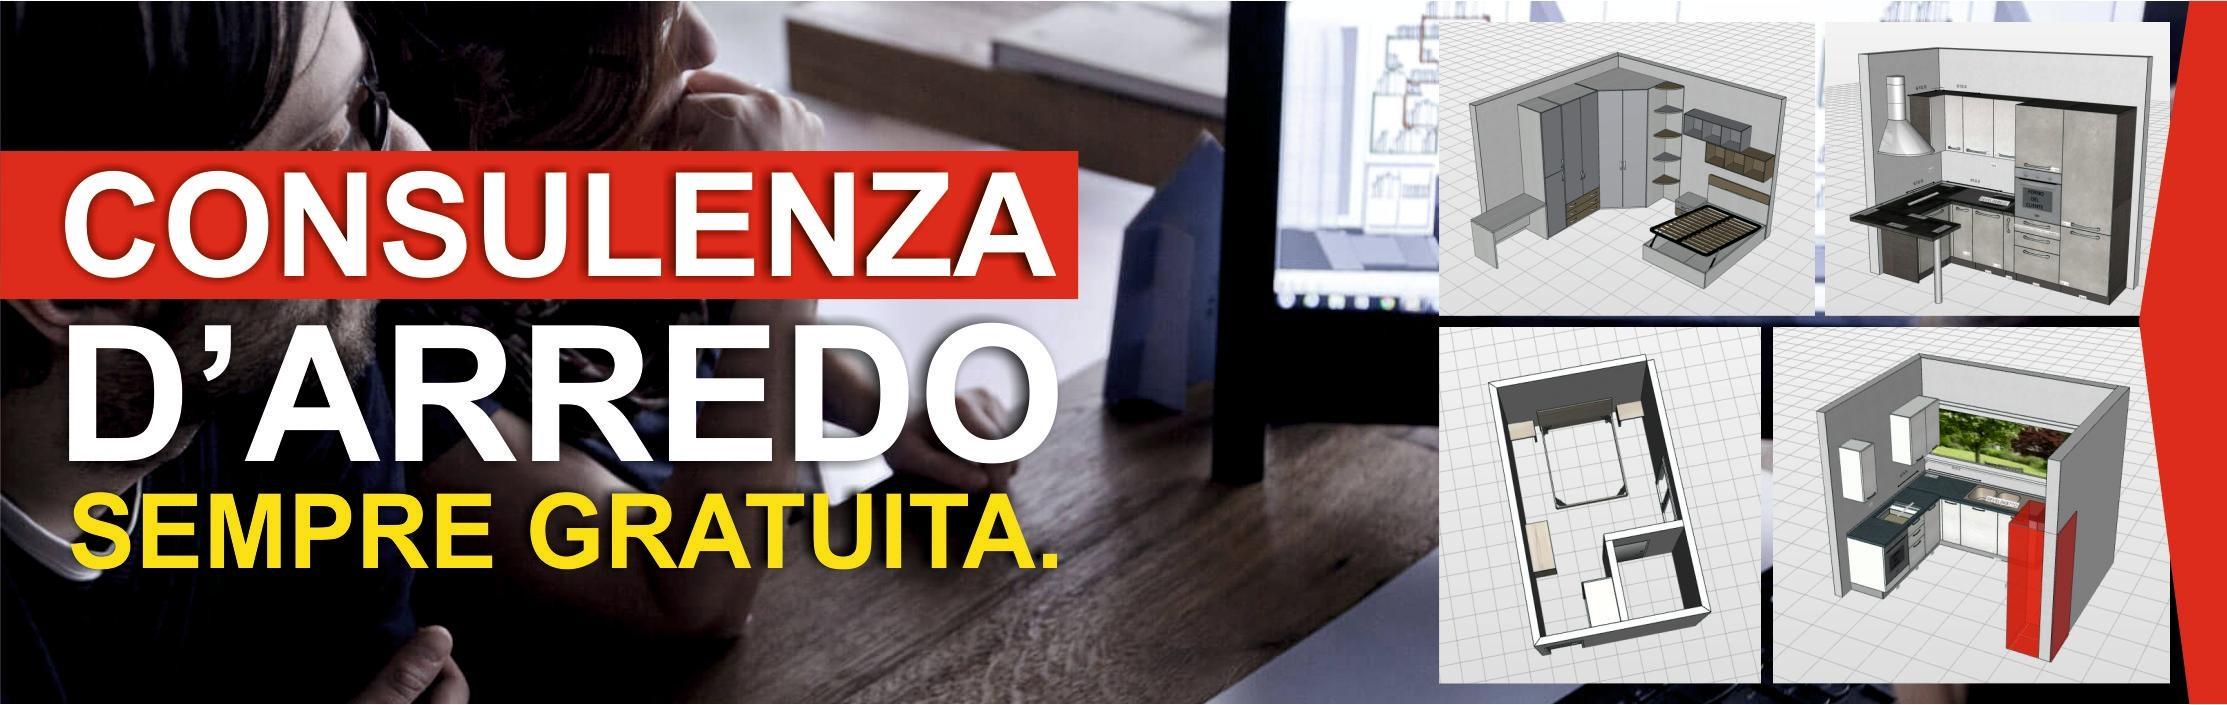 CONSULENZA D'ARREDO